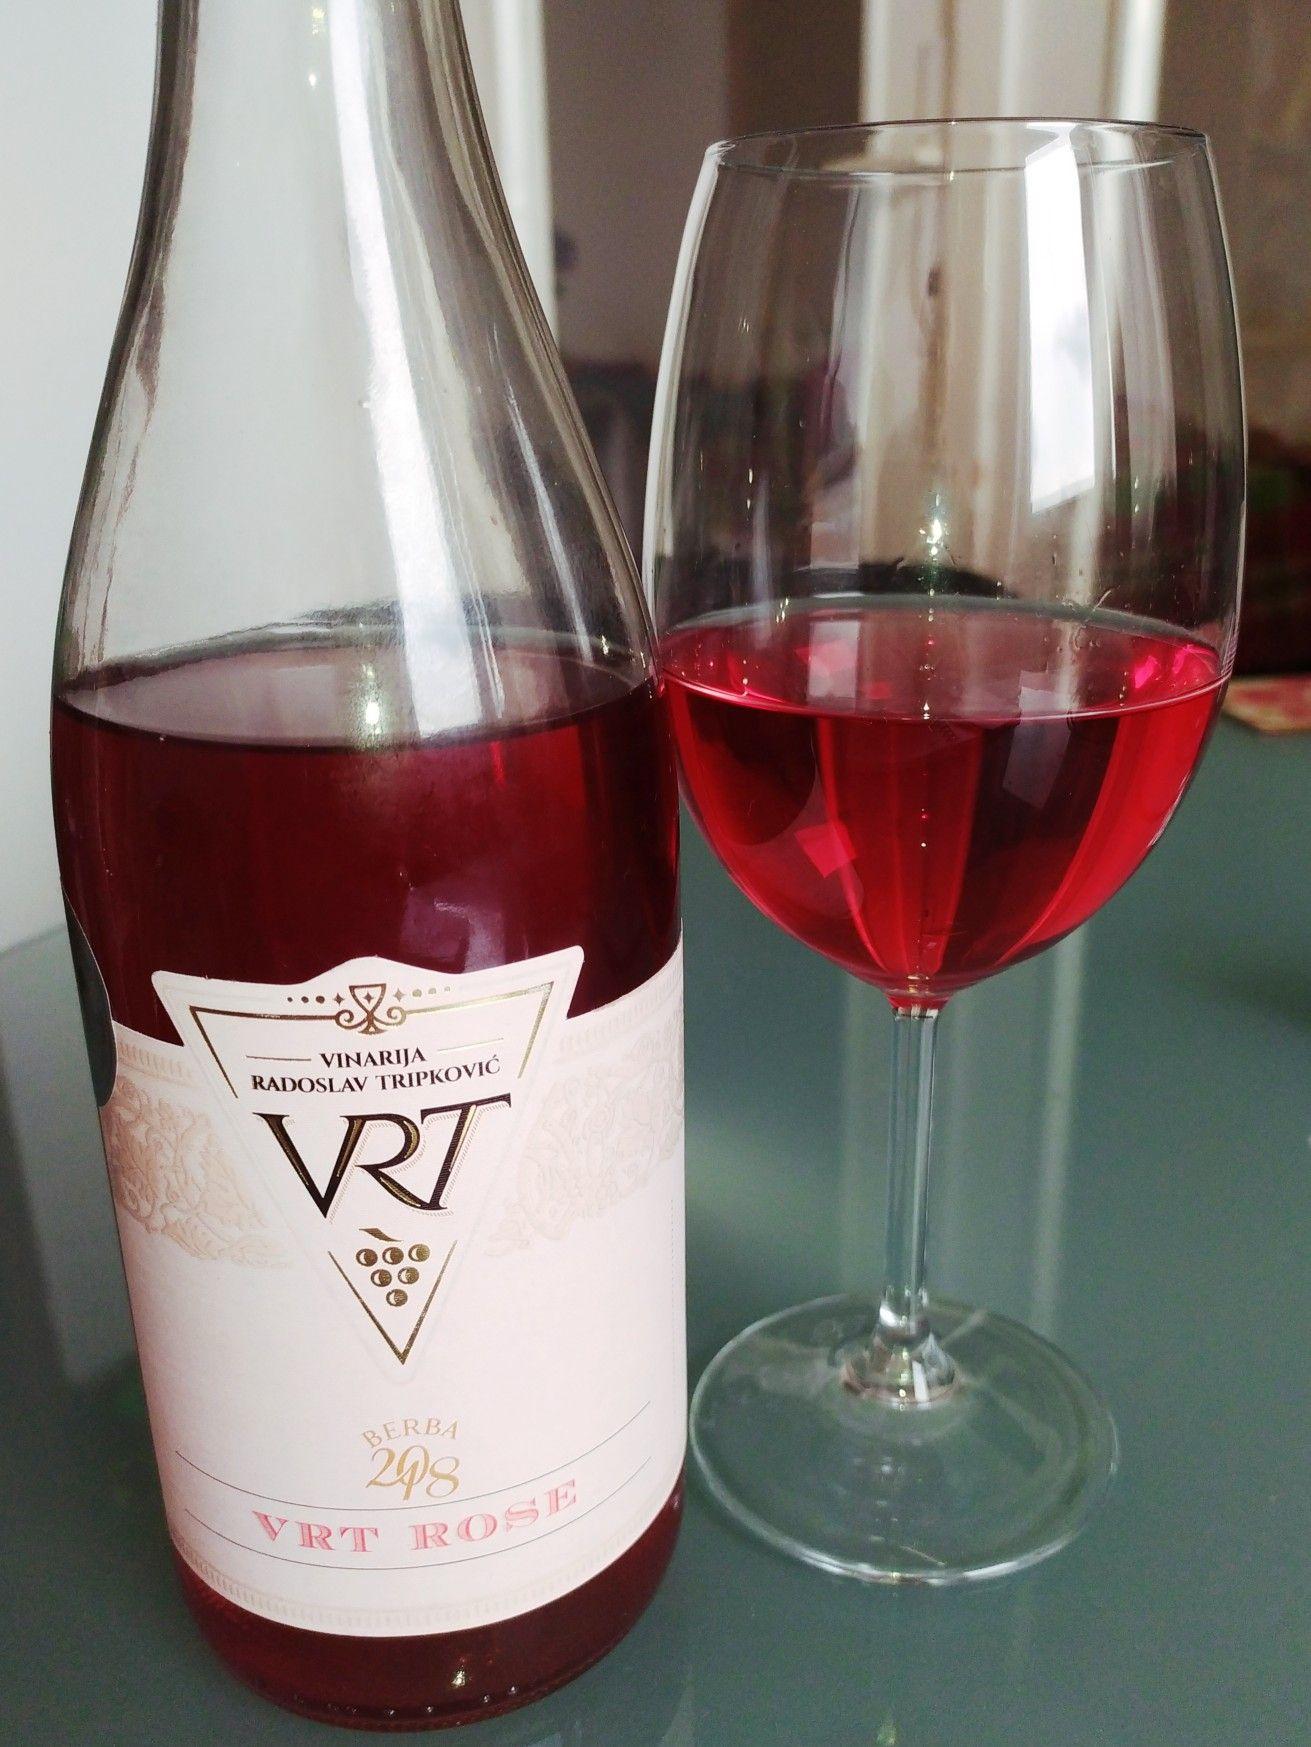 Rose Wine Vrt Winery Sombor In 2020 Rose Wine Wine Wine Bottle